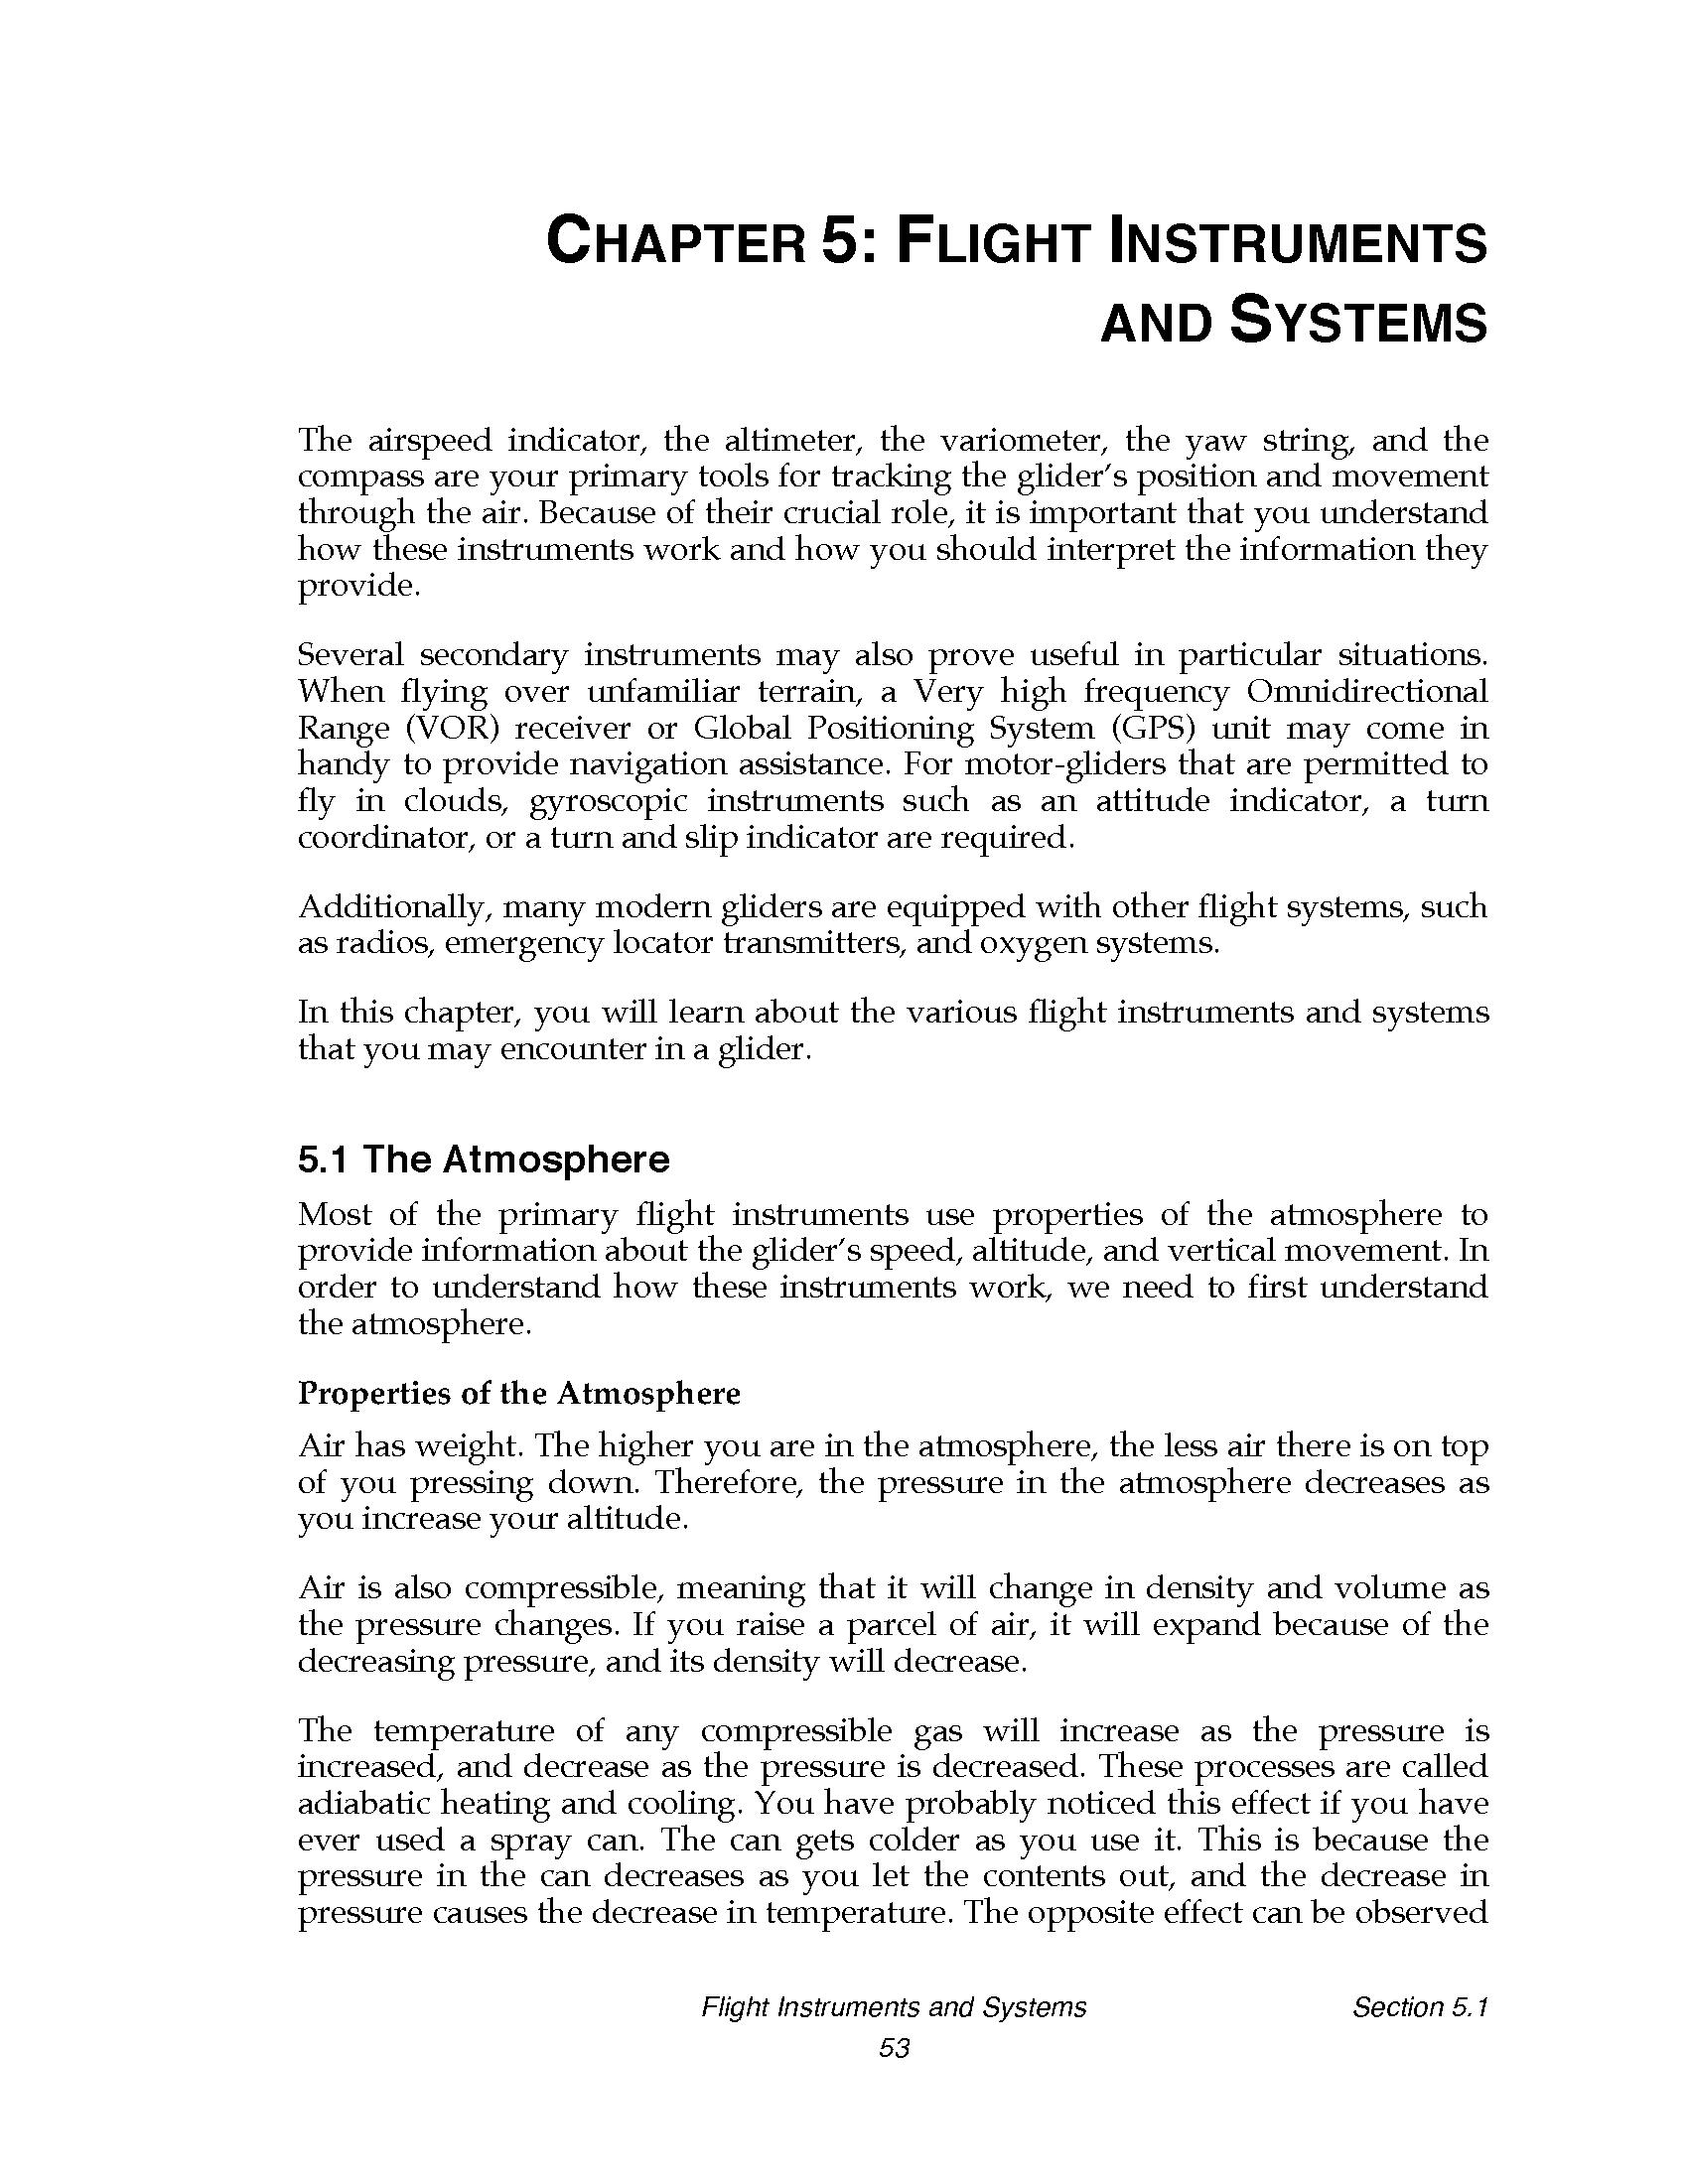 Glider Pilot's Handbook of Aeronautical Knowledge